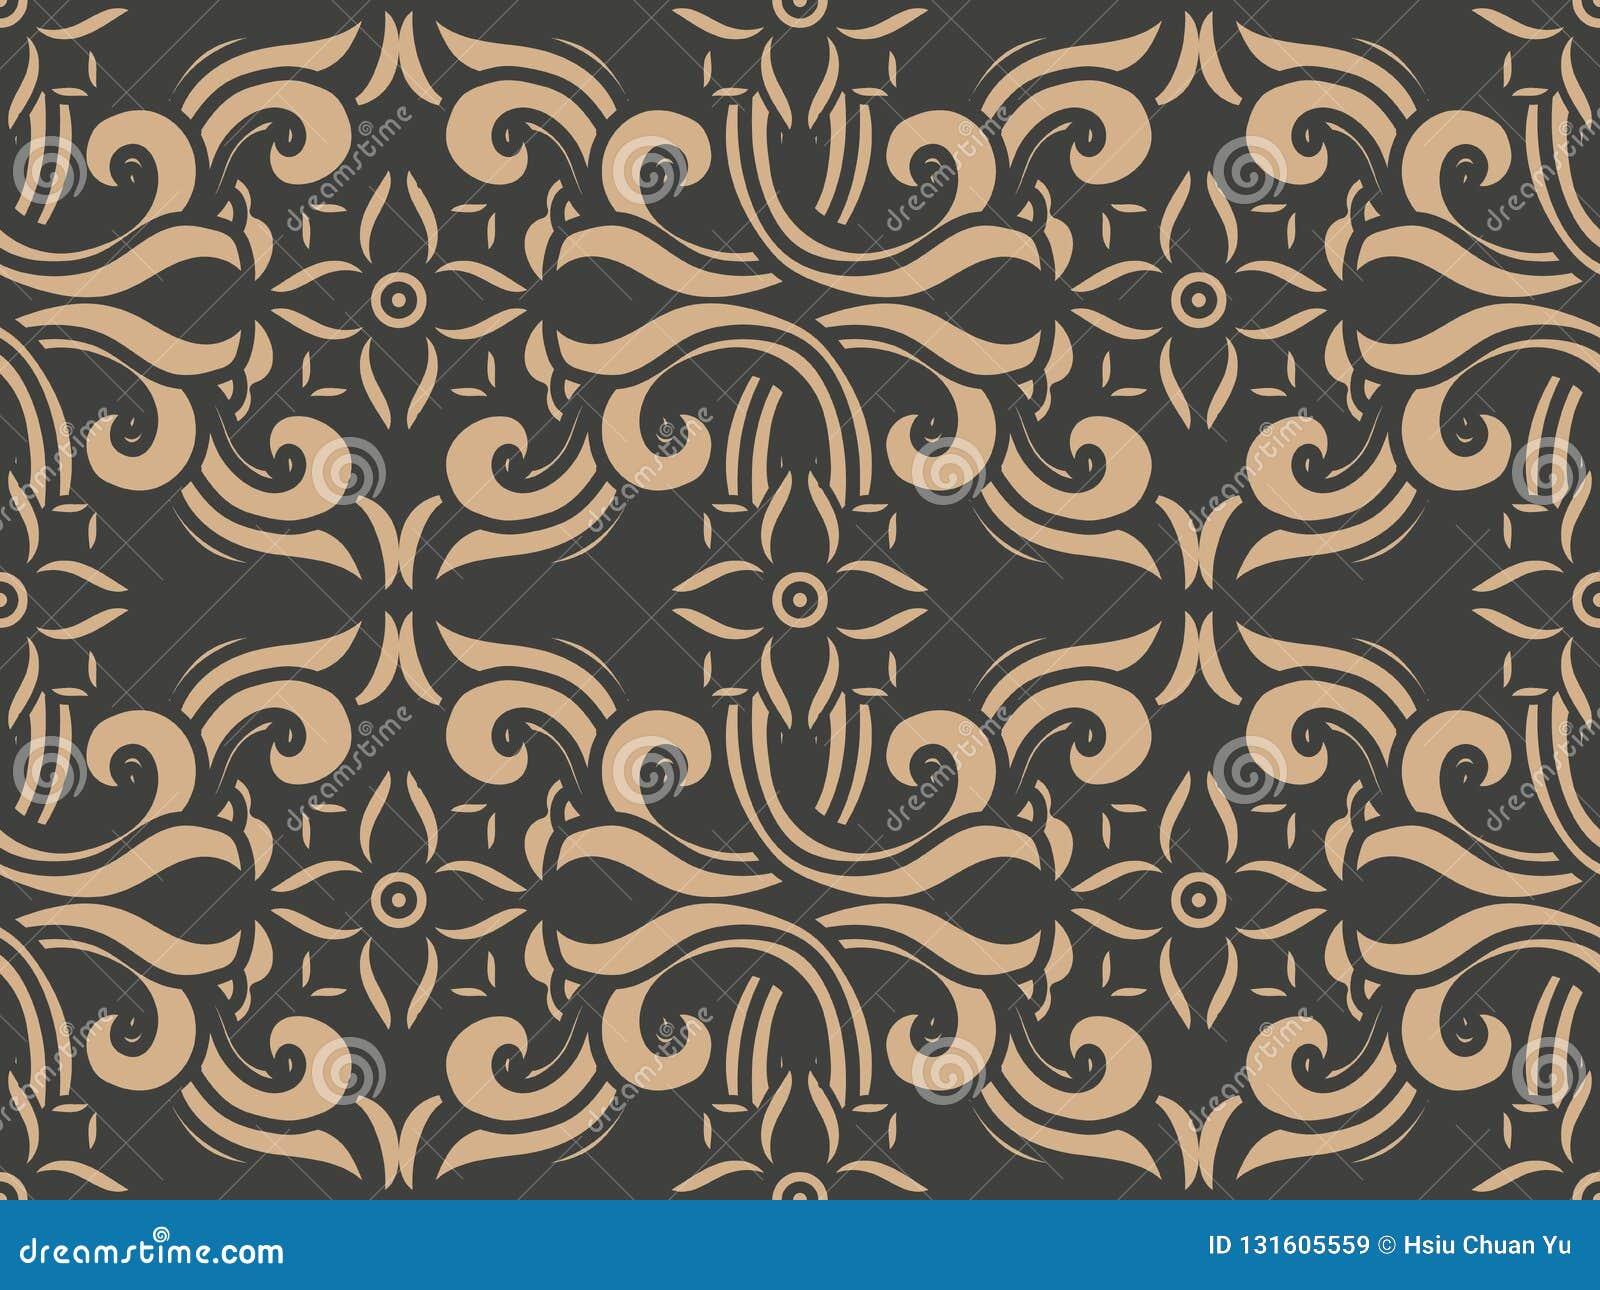 Vector damask seamless retro pattern background spiral curve cross frame flower vine